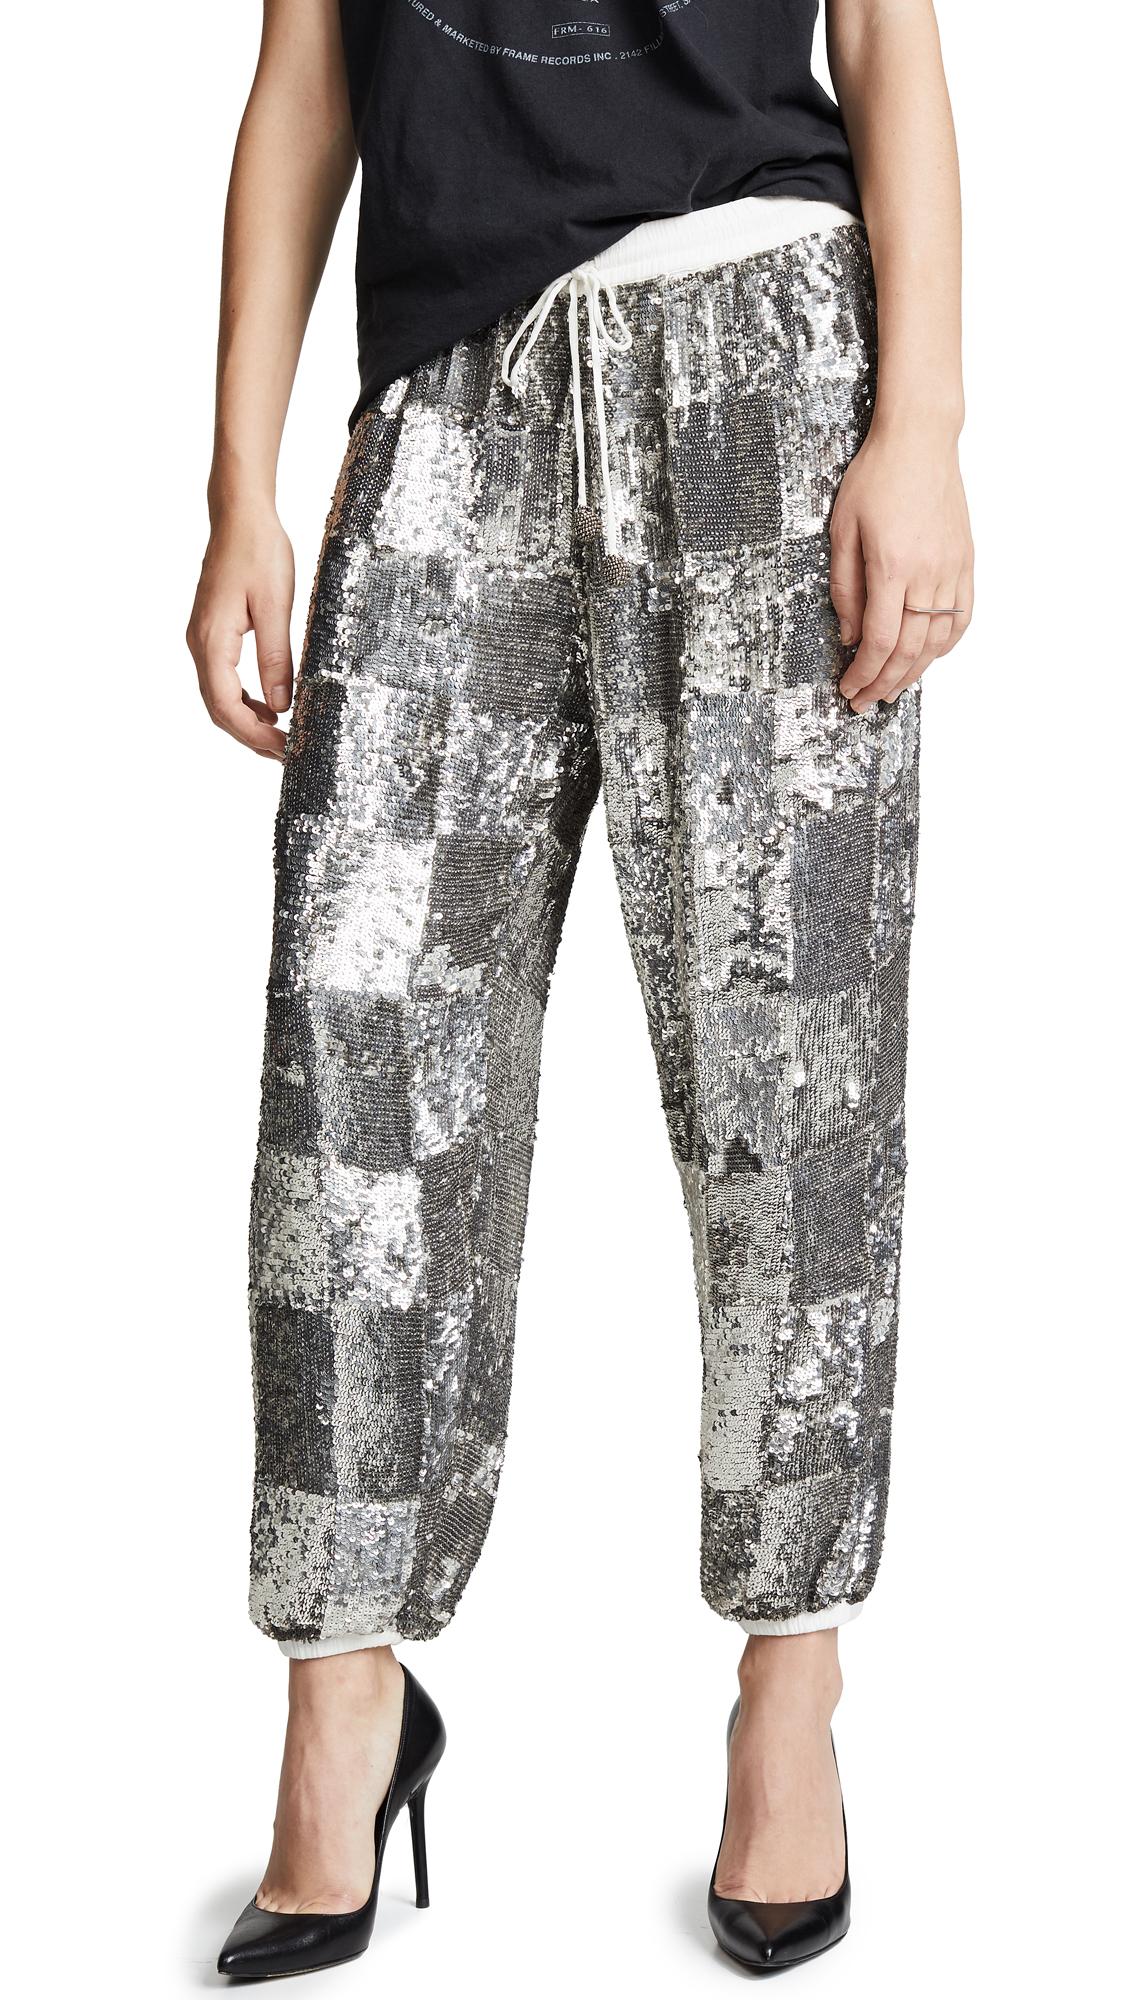 RETROFÉTE Stacia Pants in Silver